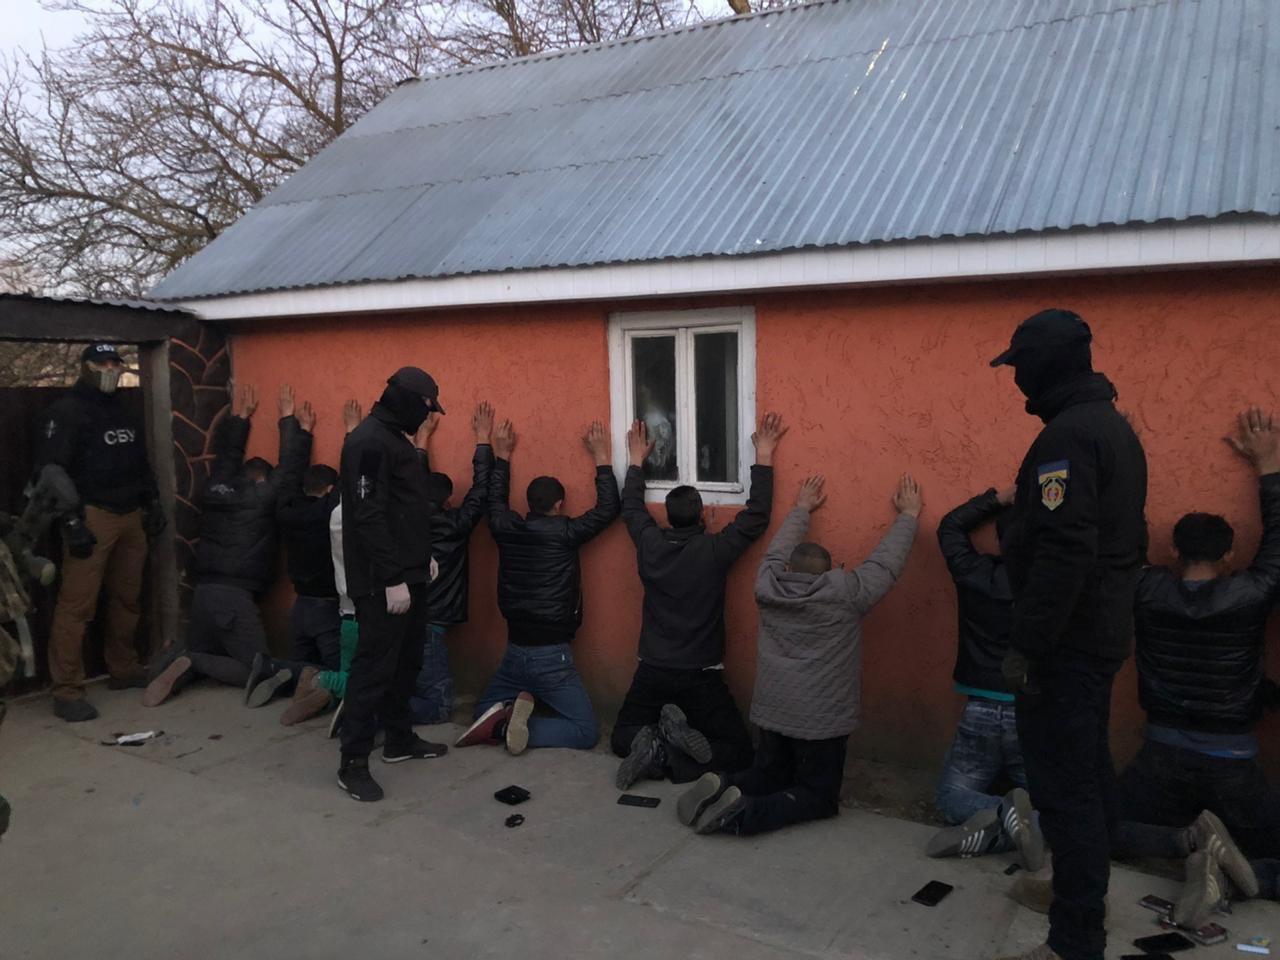 Затримано циганського авторитета, причетного до стрілянини у Великих Лучках